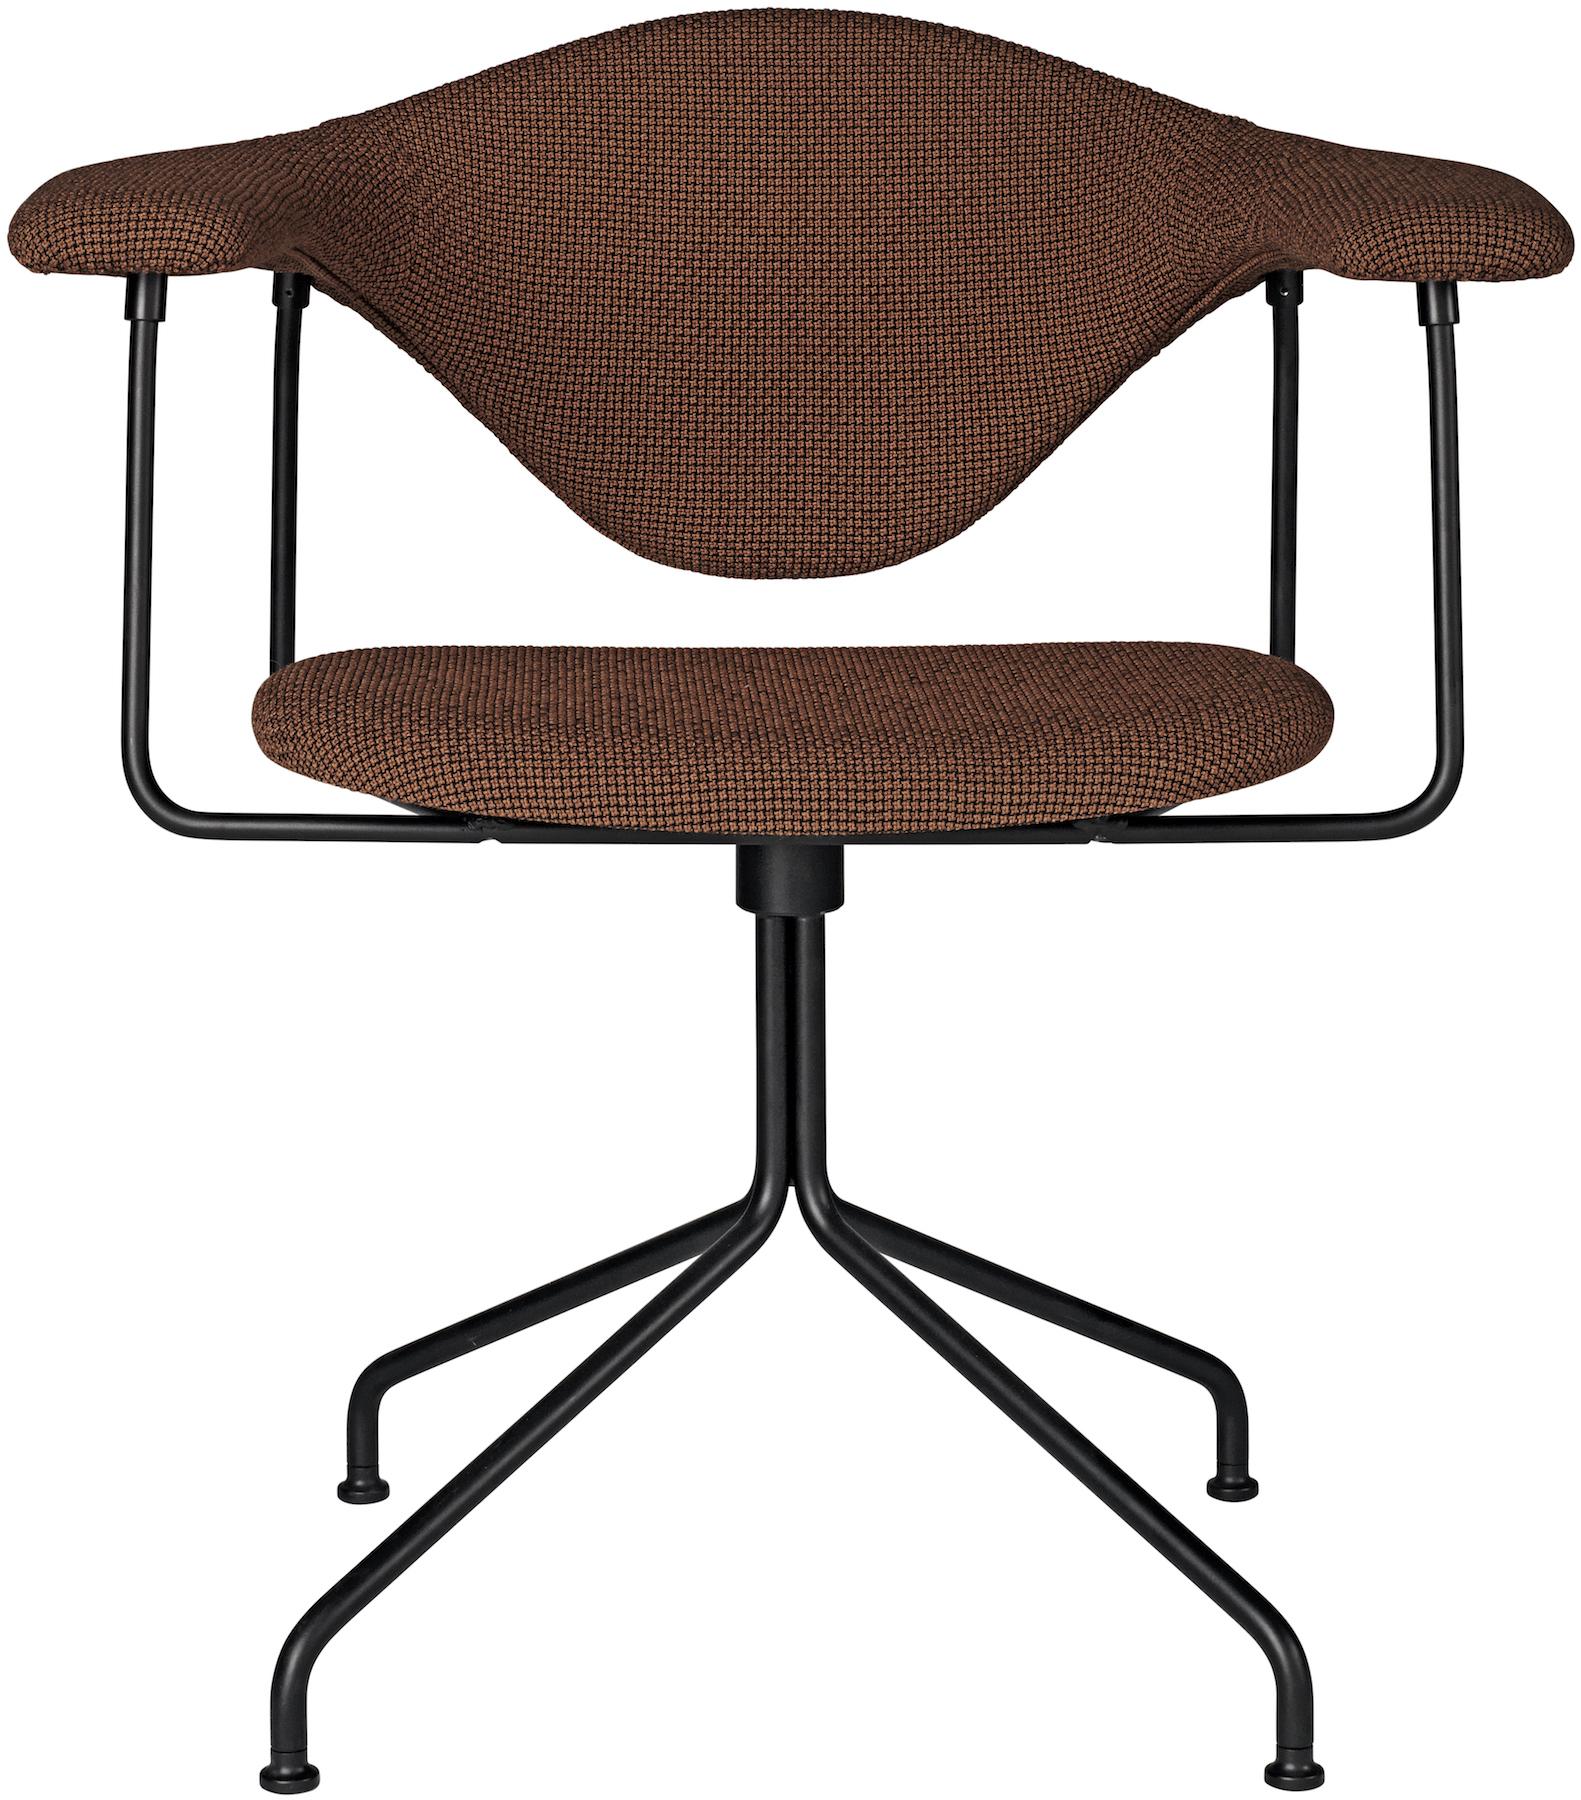 gubi chaise masculo design gamfratesi. Black Bedroom Furniture Sets. Home Design Ideas